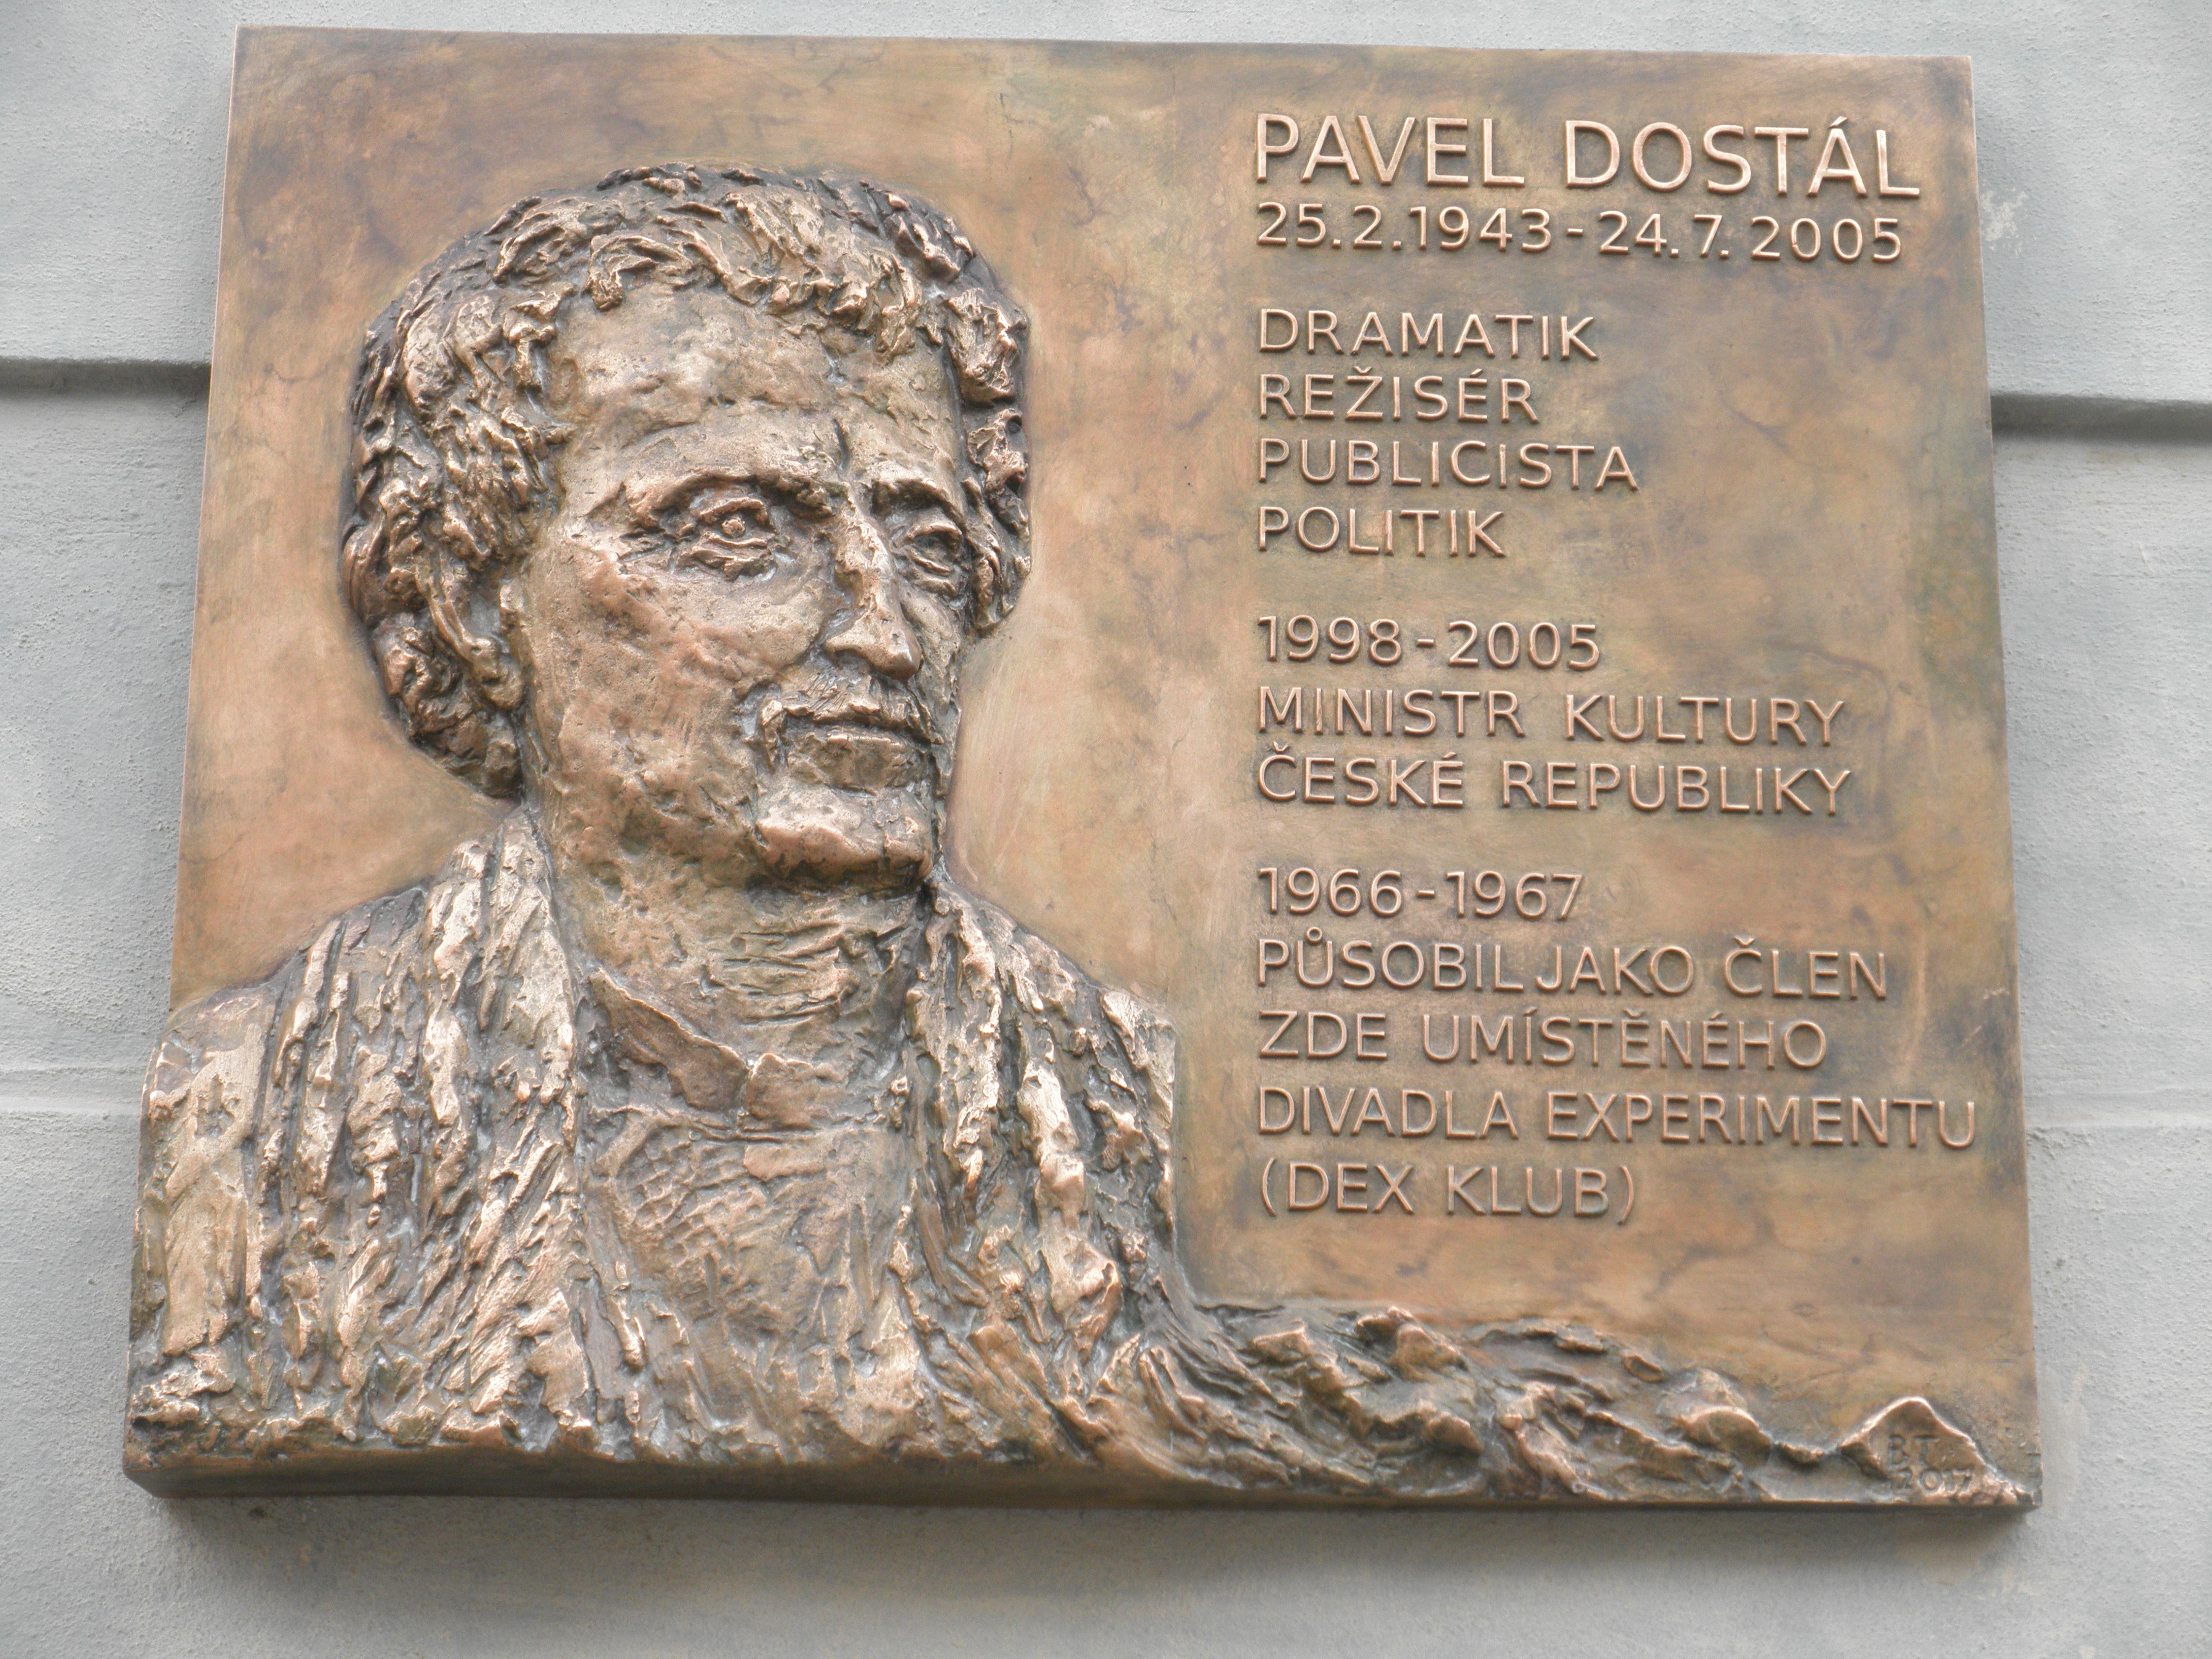 Memorial plaque to Pavel Dostál in Olomouc